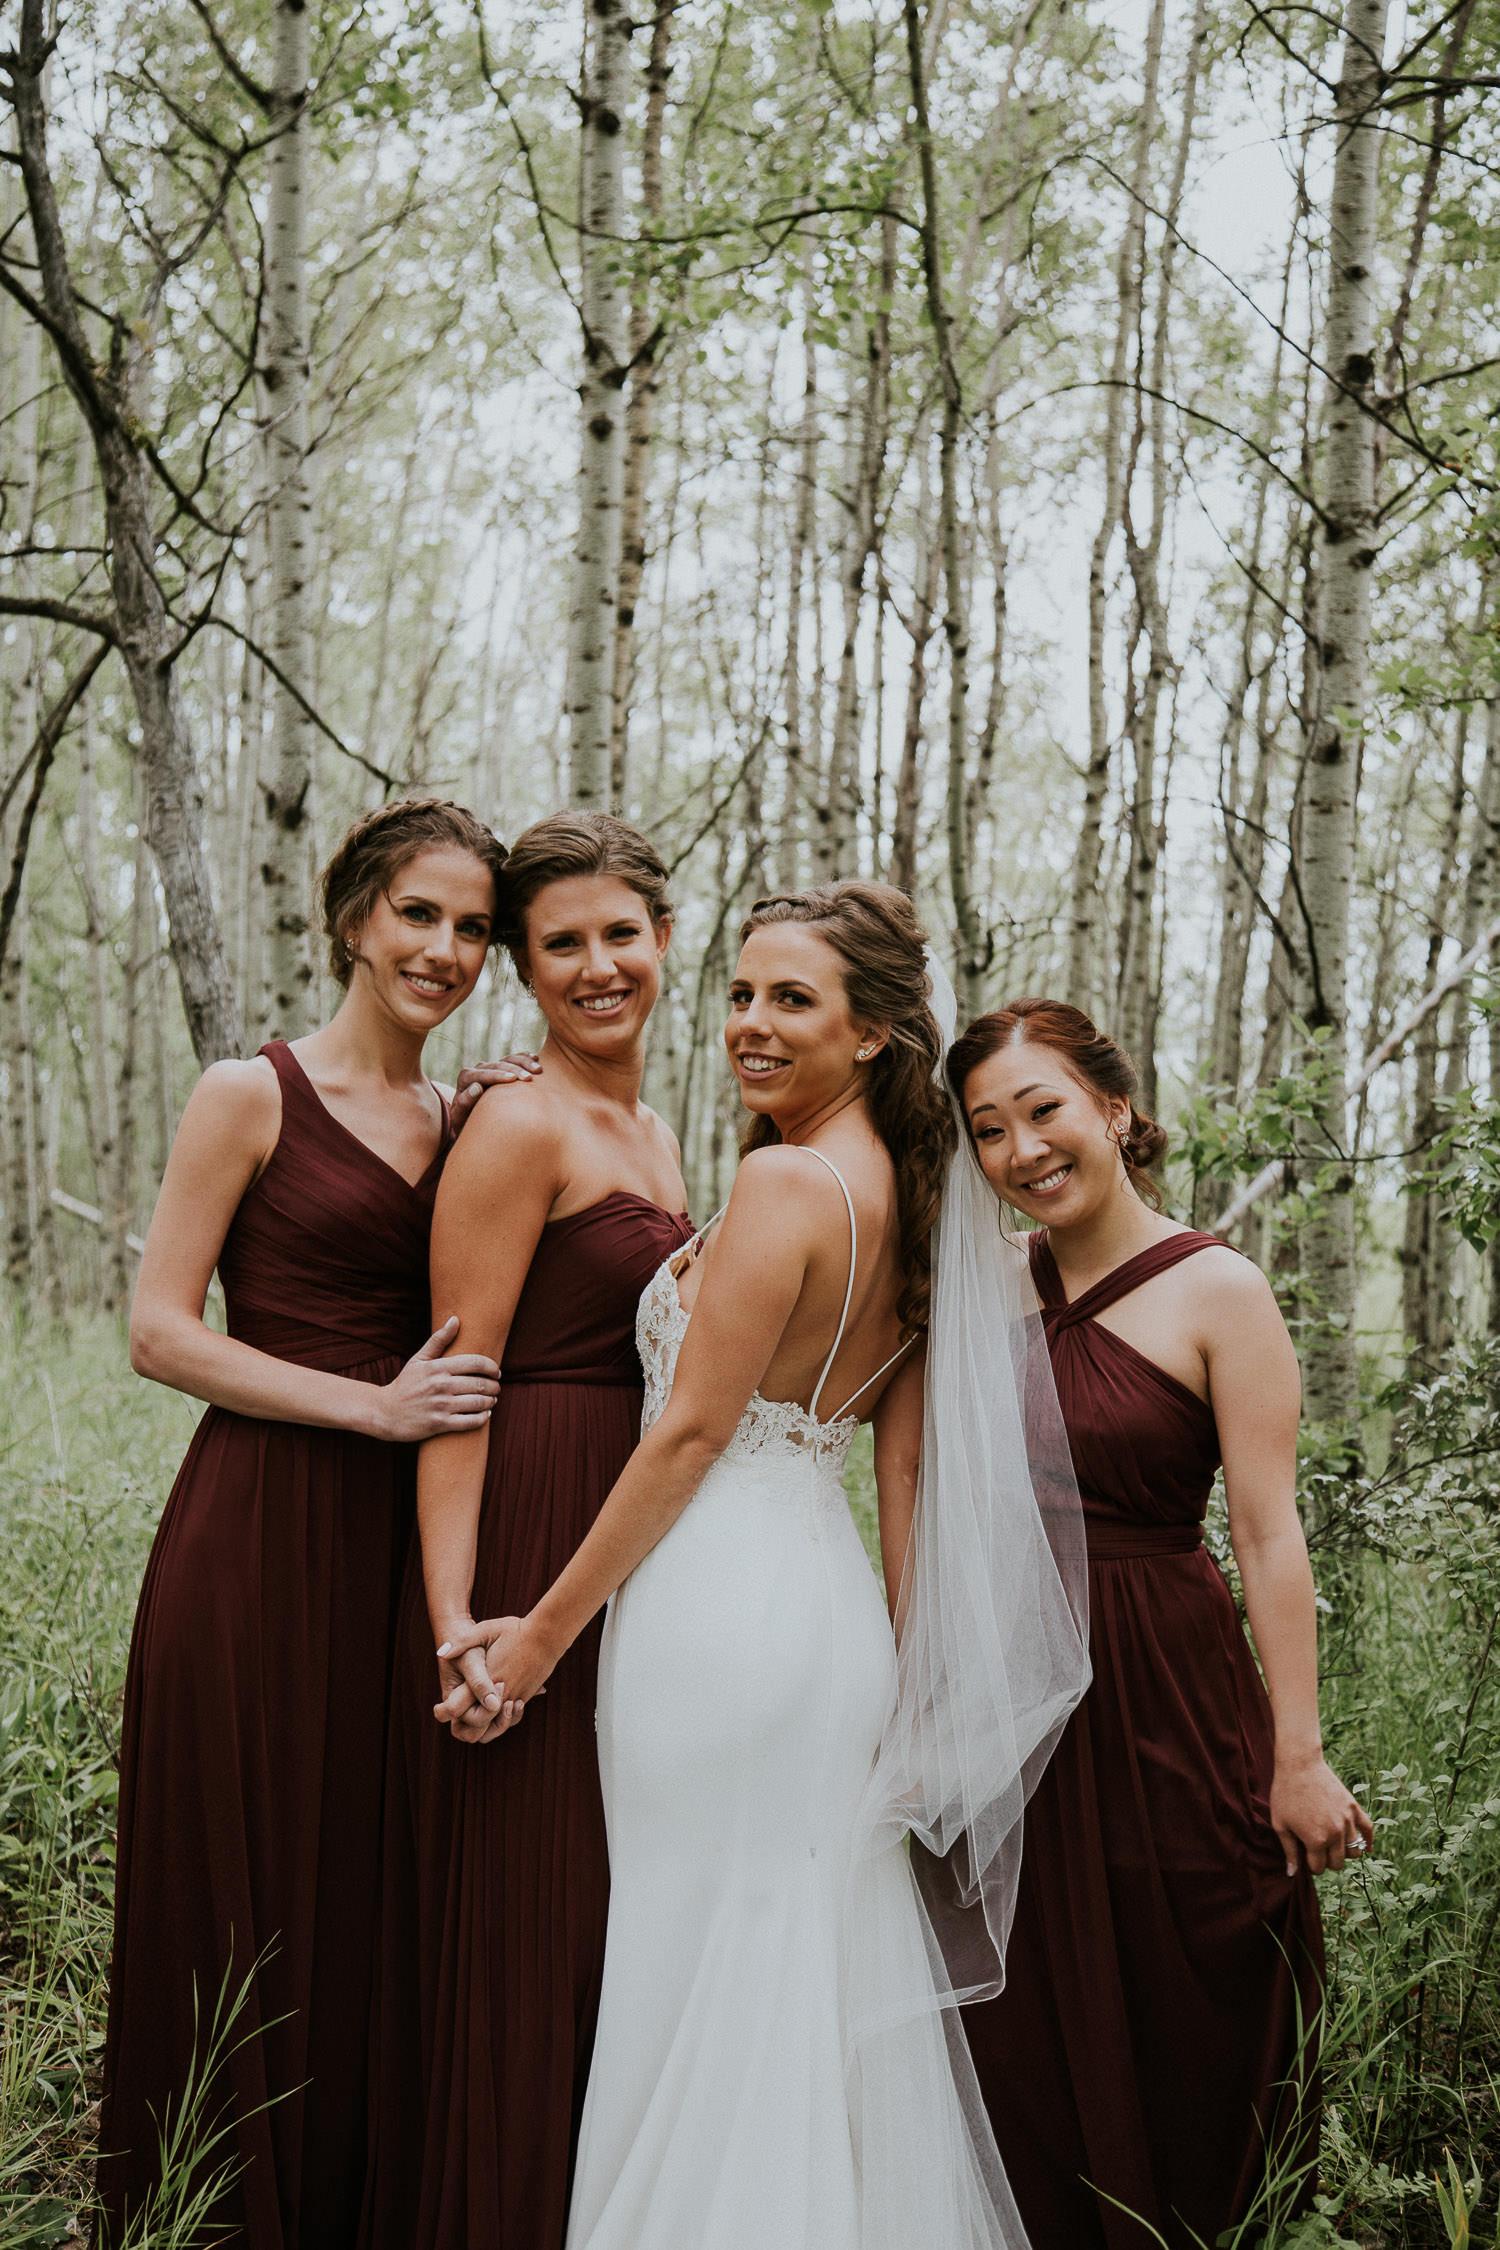 valley-ridge-golf-club-wedding-sarah-pukin-0086